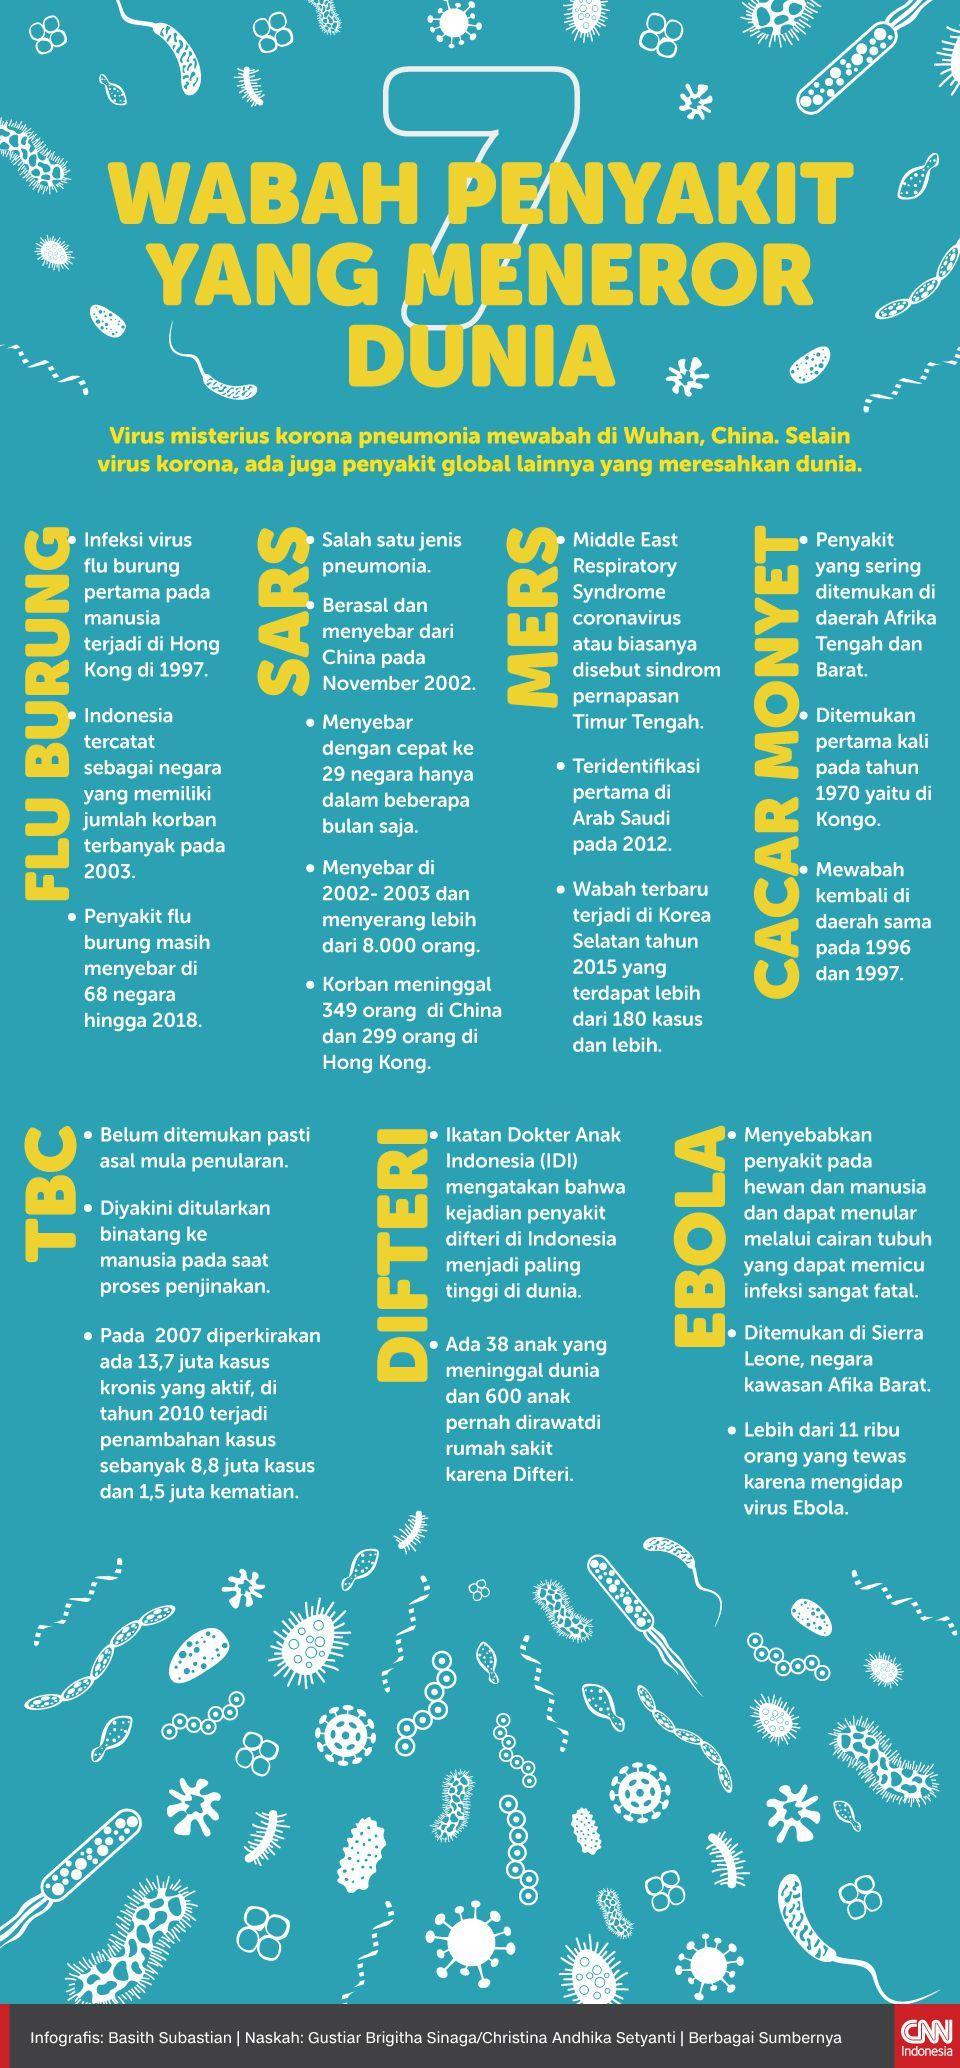 Infografis 7 Wabah Penyakit yang Meneror Dunia